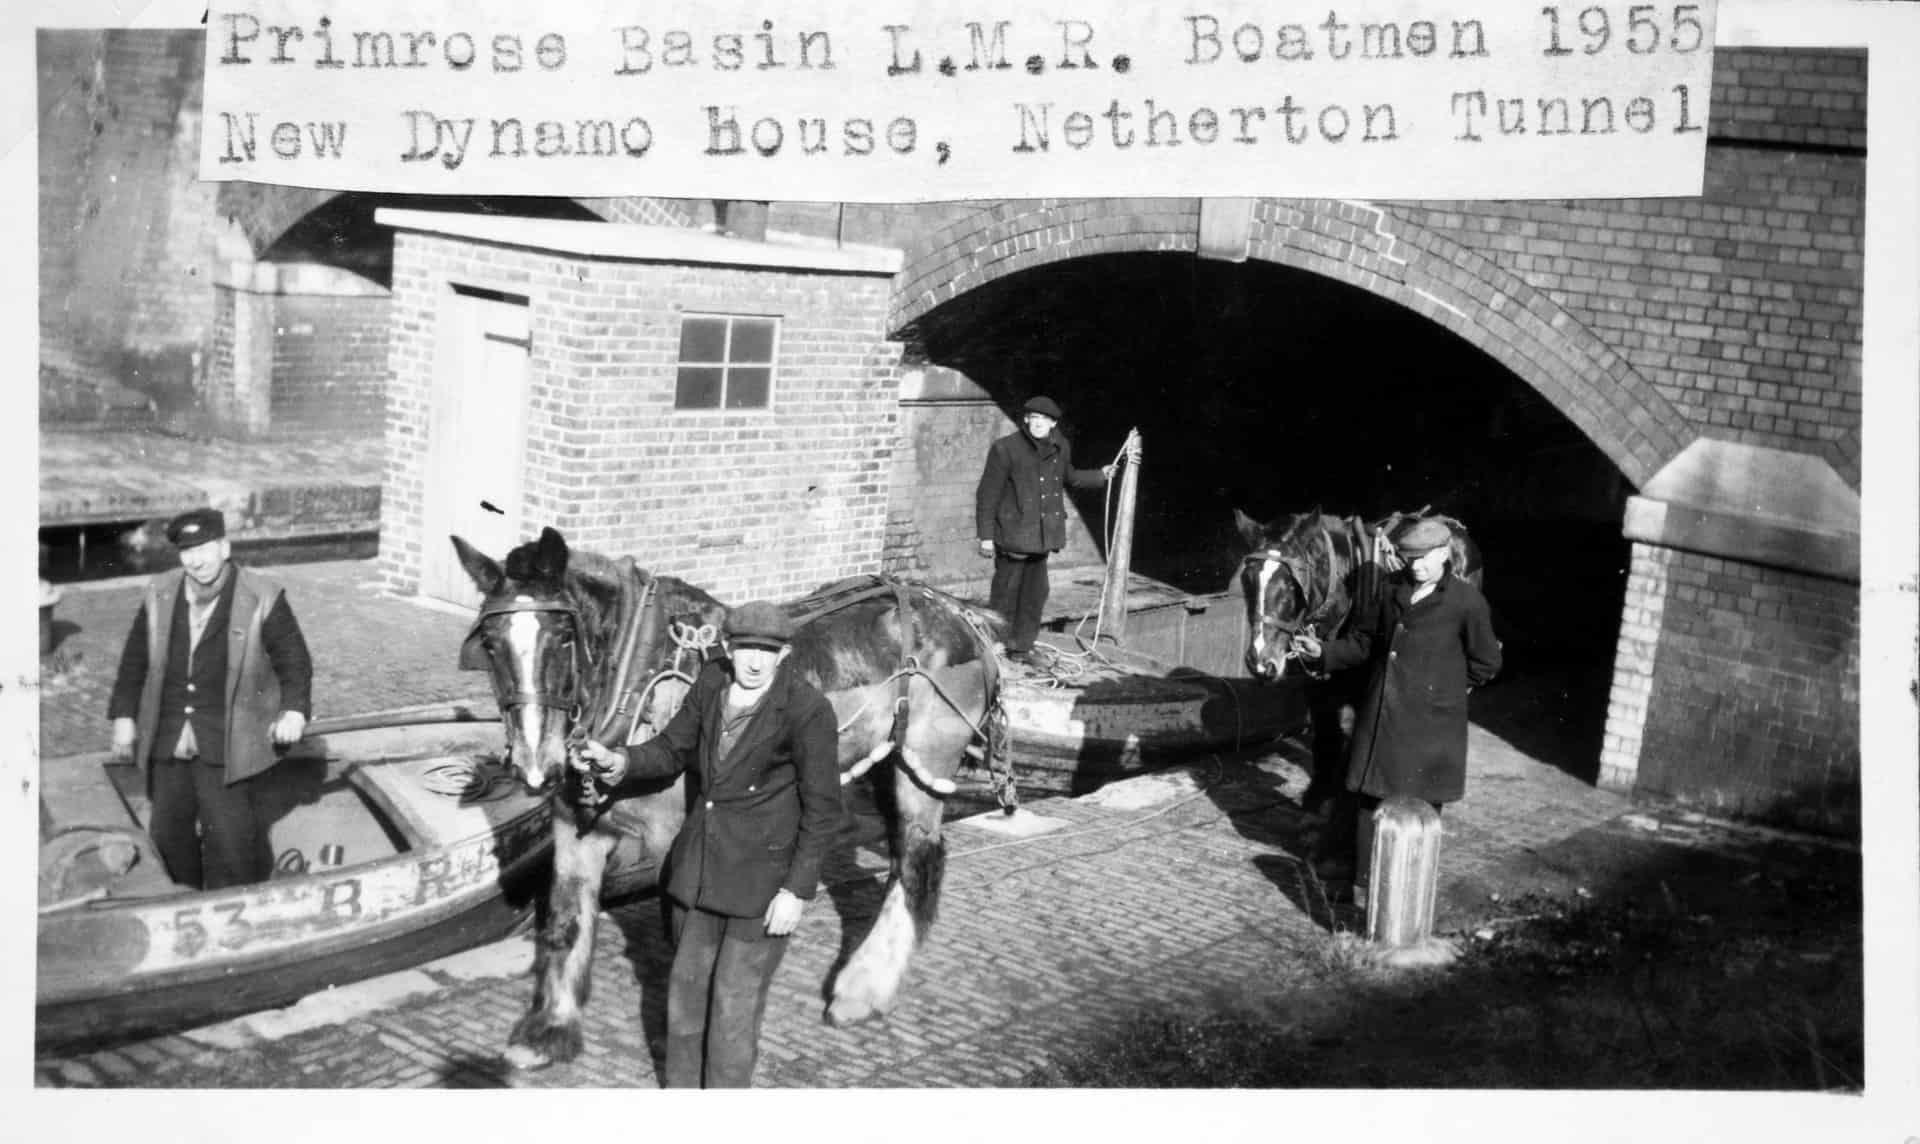 Primrose Basin L.M.R. Boatmen, the new dynamo house, Netherton Tunnel 1955